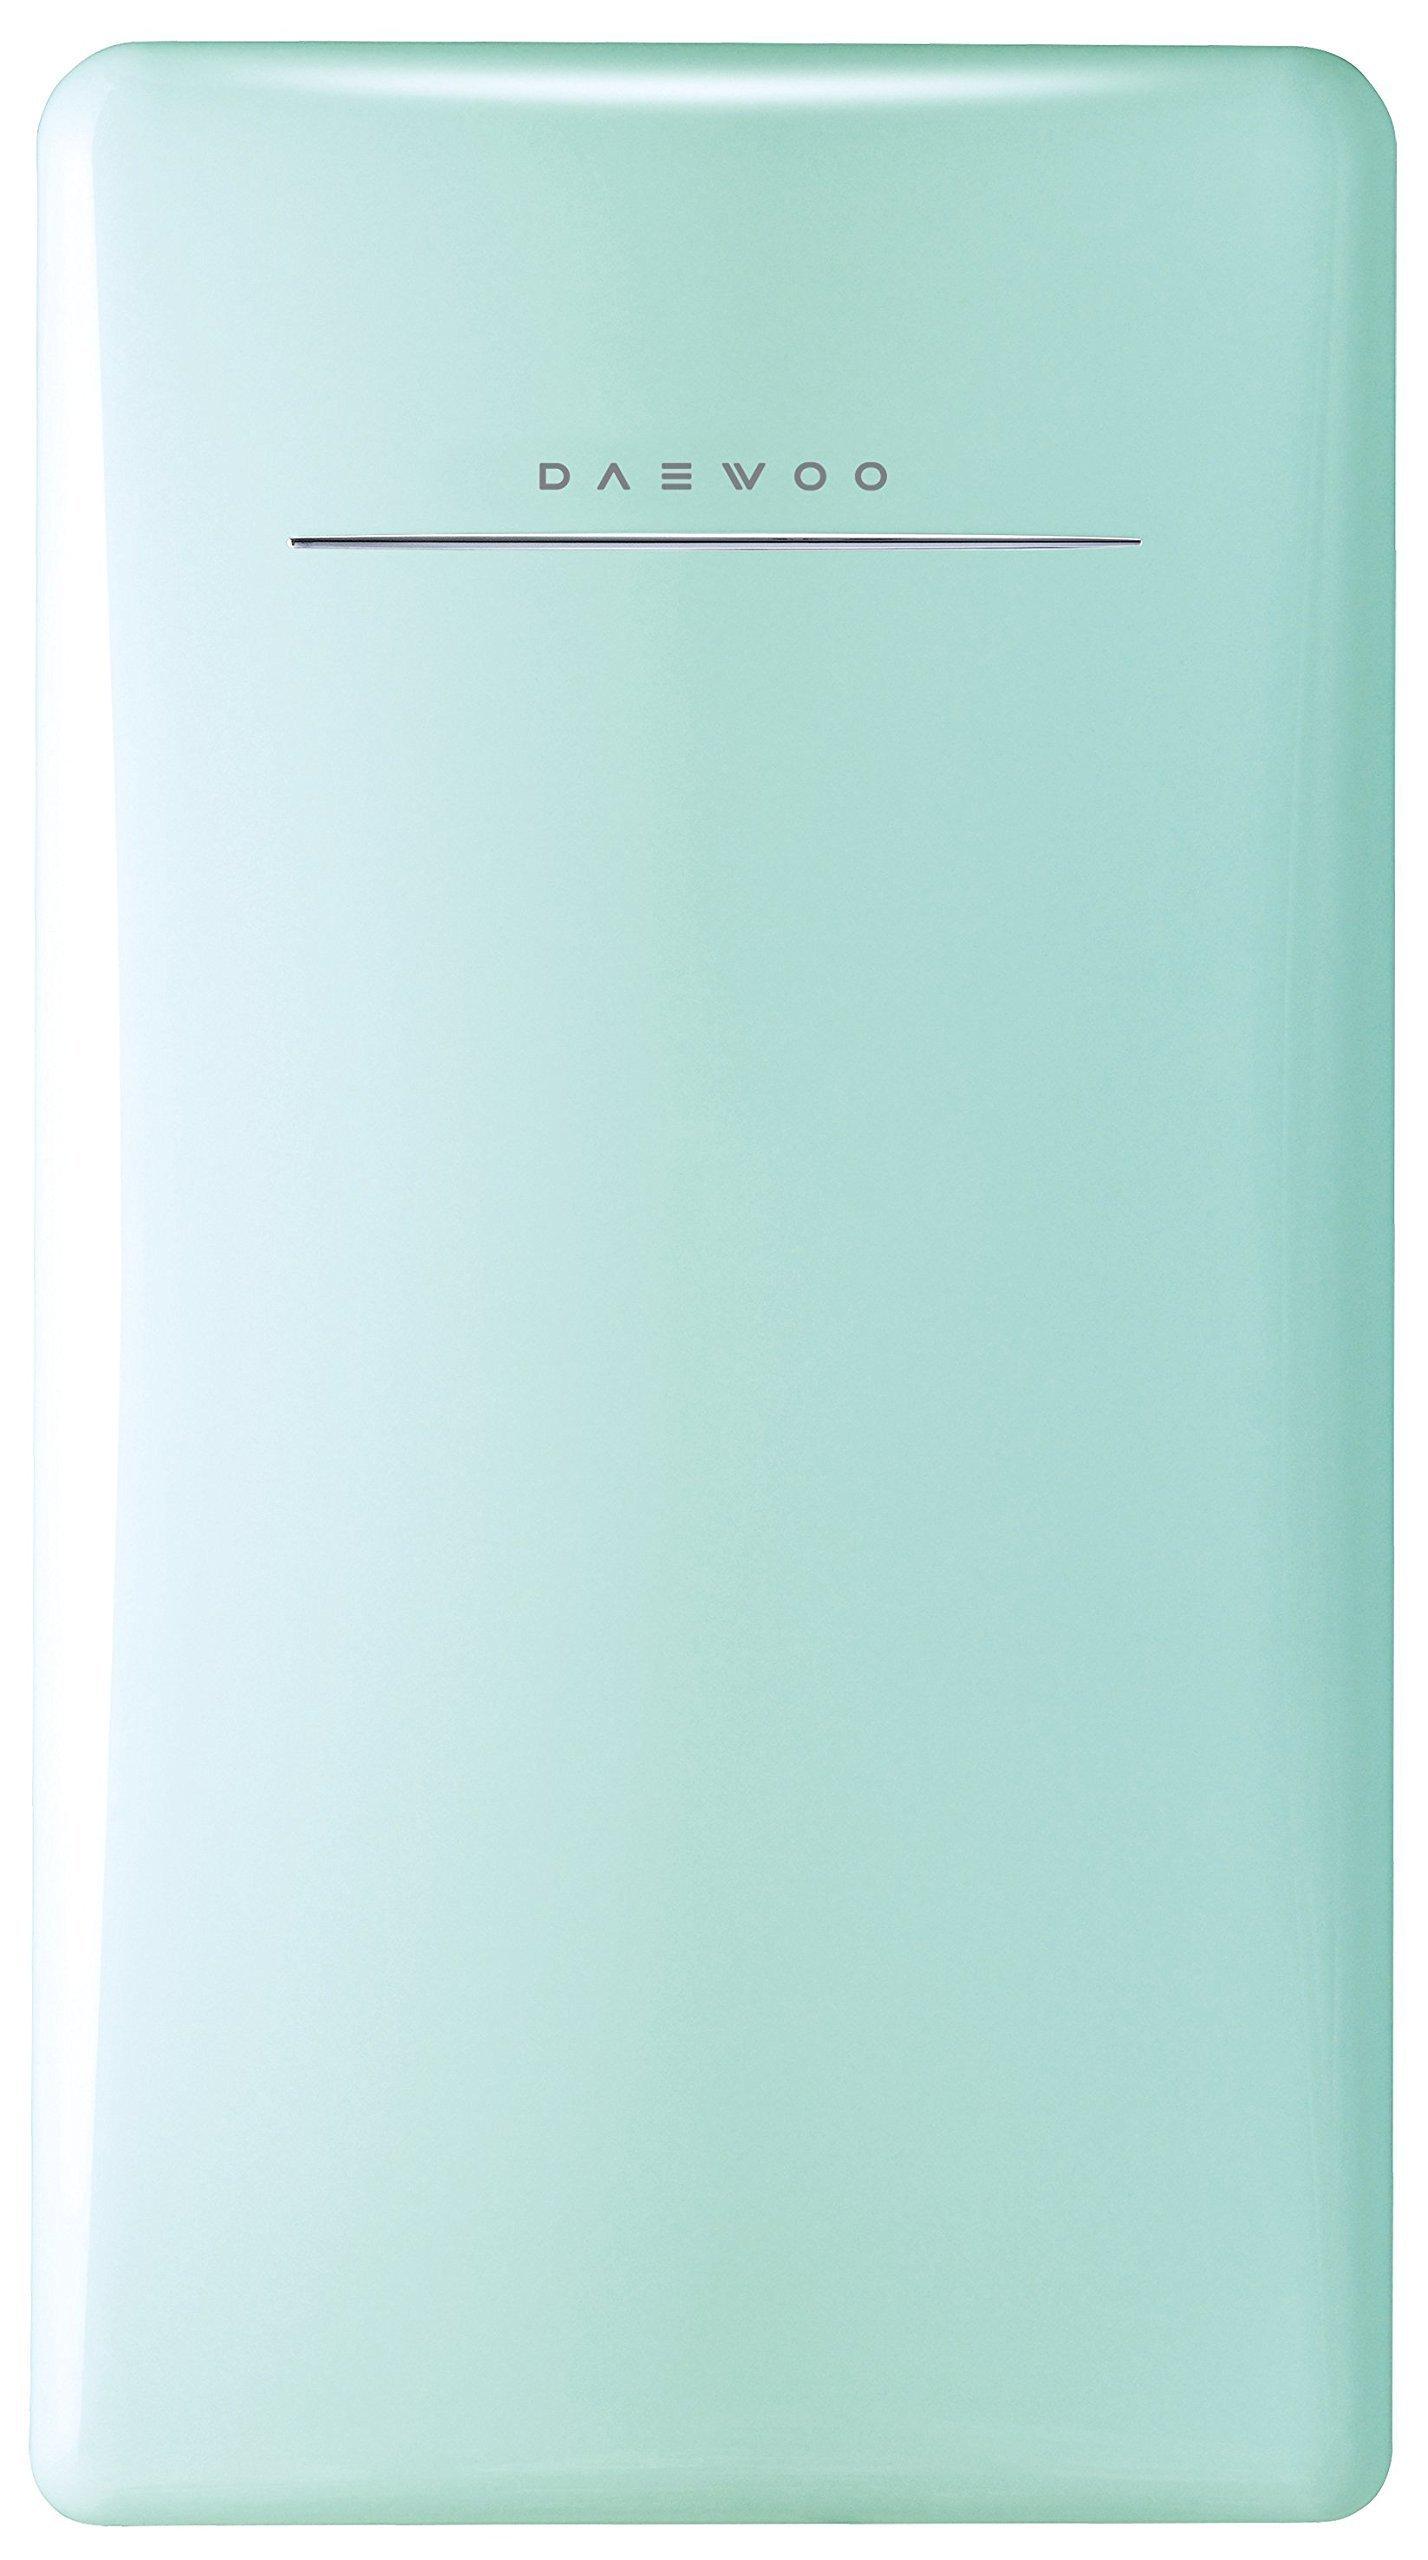 Daewoo FR-044RCNM Retro Compact Refrigerator 4.4 Cu. Ft. | Mint Green by Daewoo